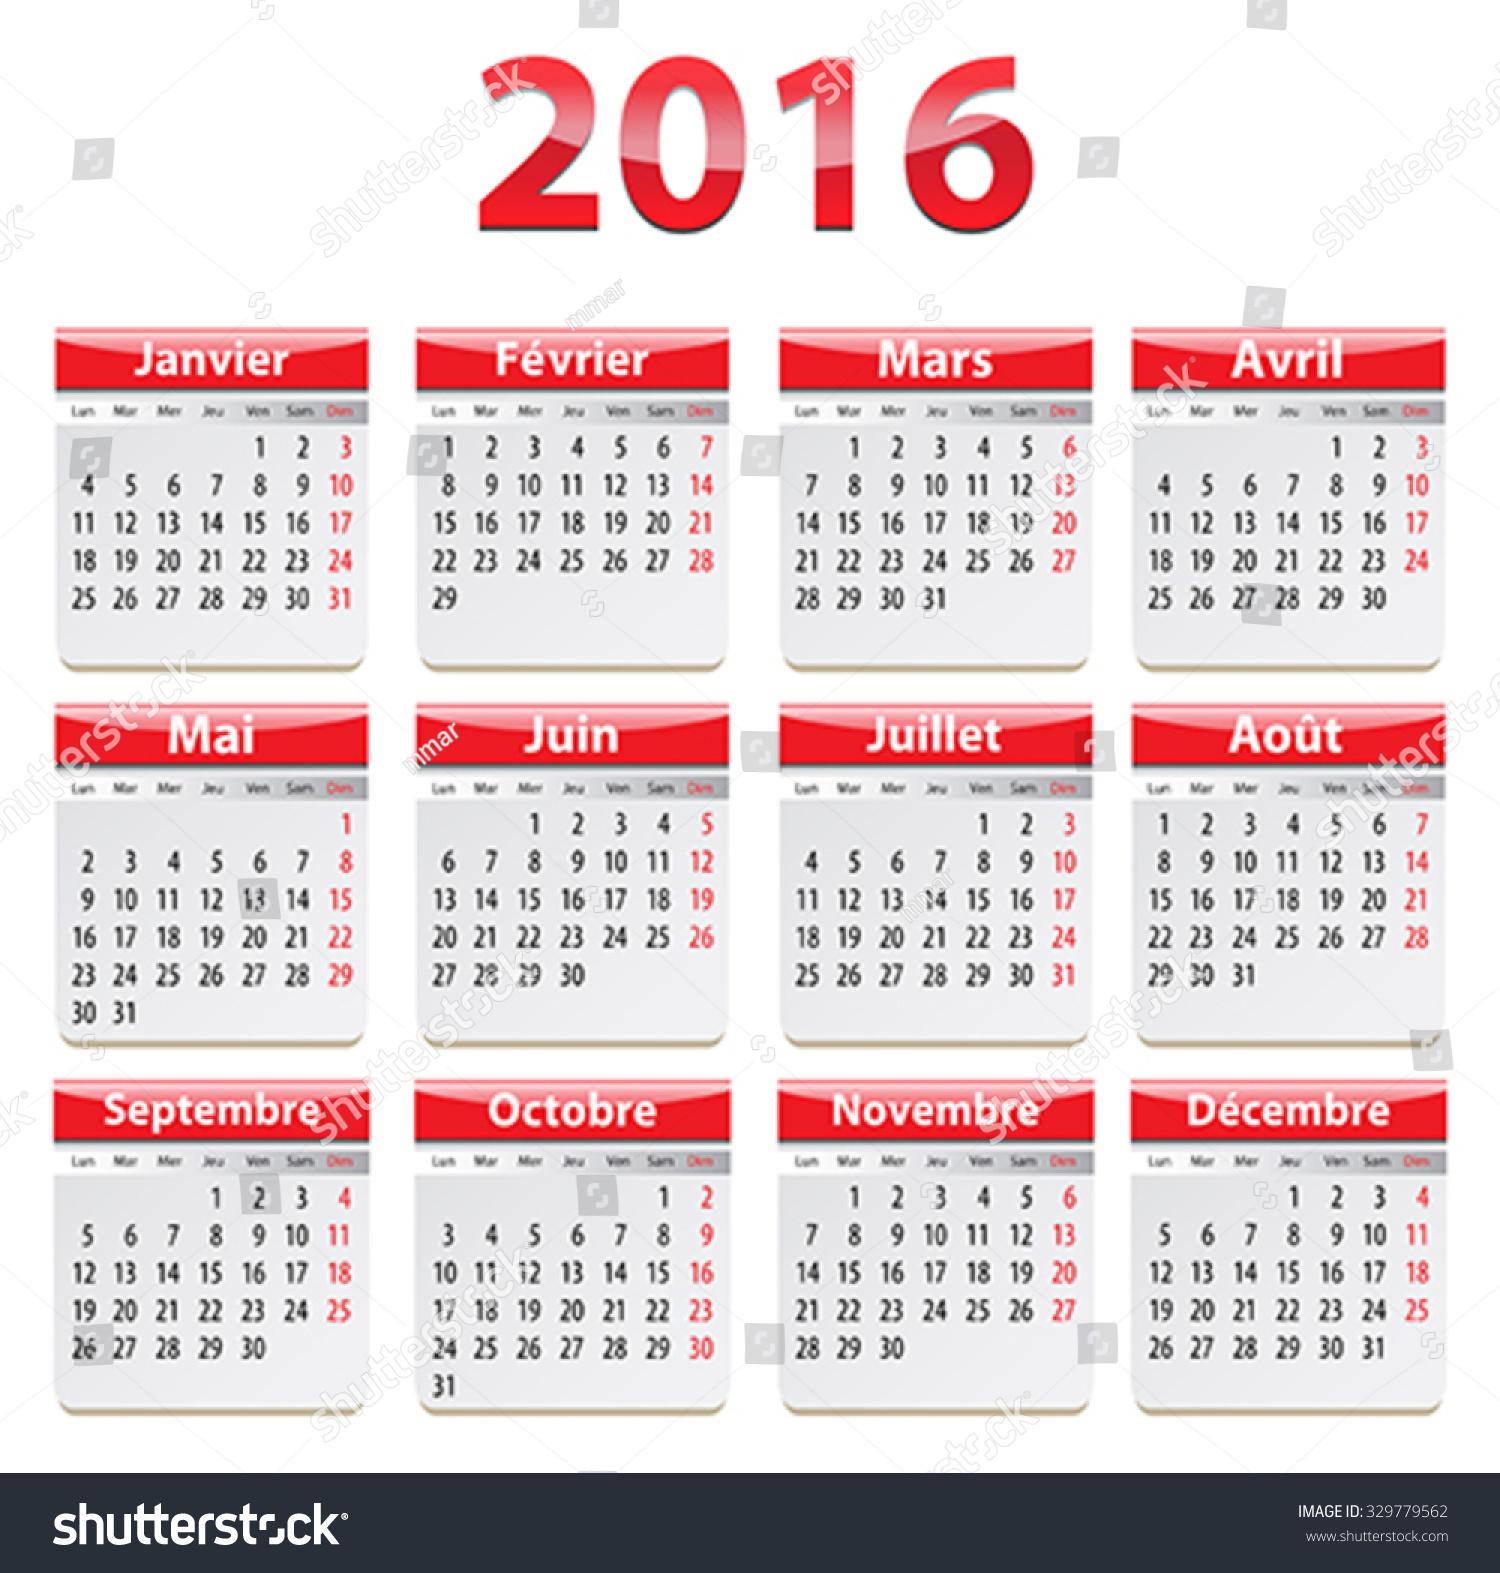 Year Calendar Vector : Calendar year french vector illustration stock